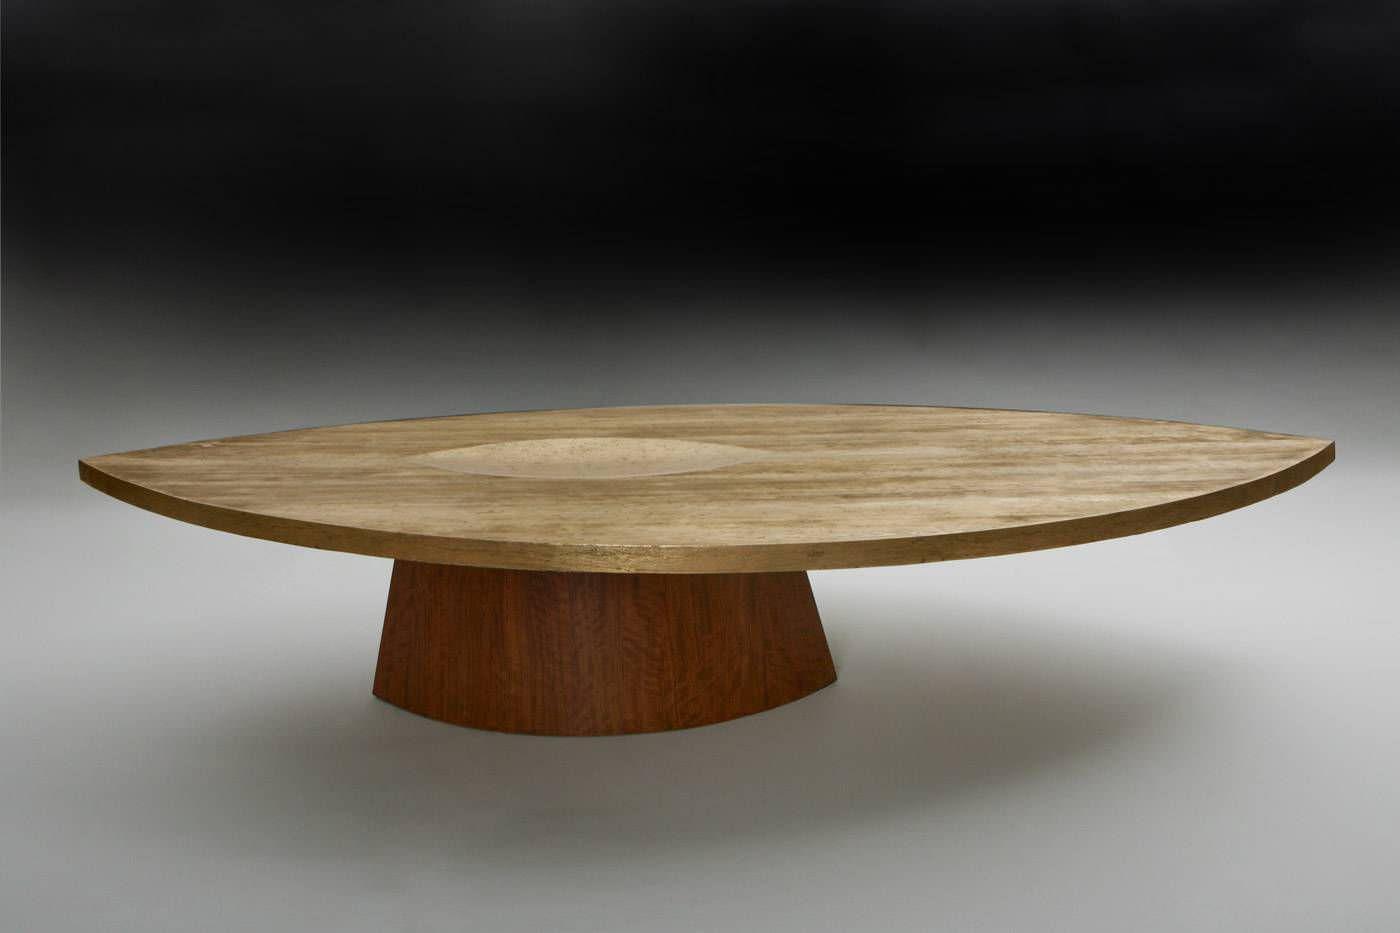 Table basse ovale bois massif design en image - Table basse ovale pas cher ...